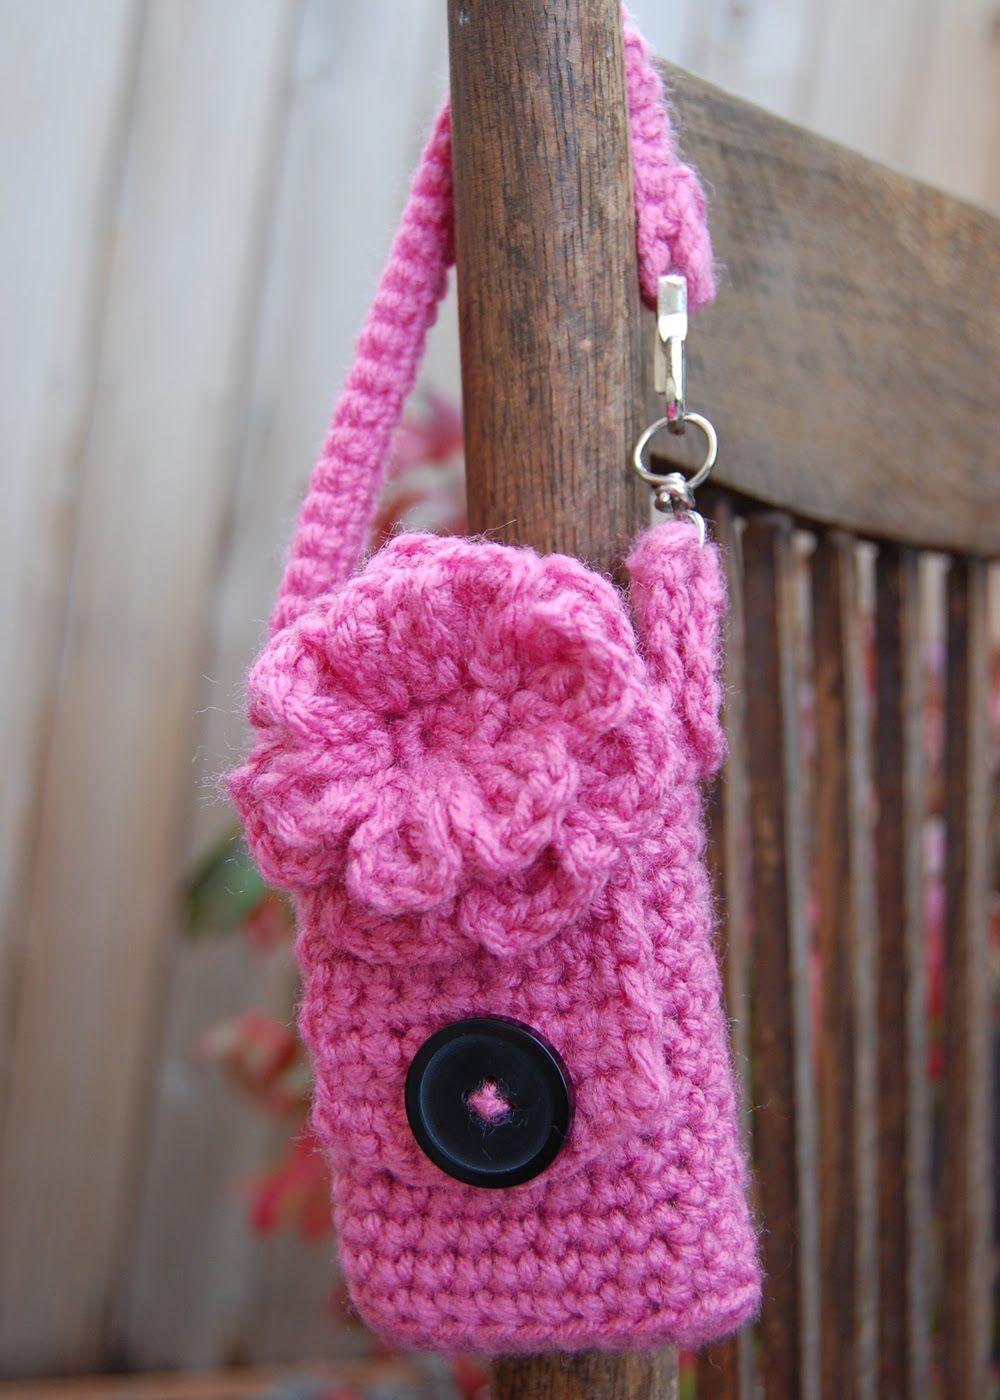 Bend Beanies: Cell Phone Case - Free Crochet Pattern! | CRAFTS:TECH ...